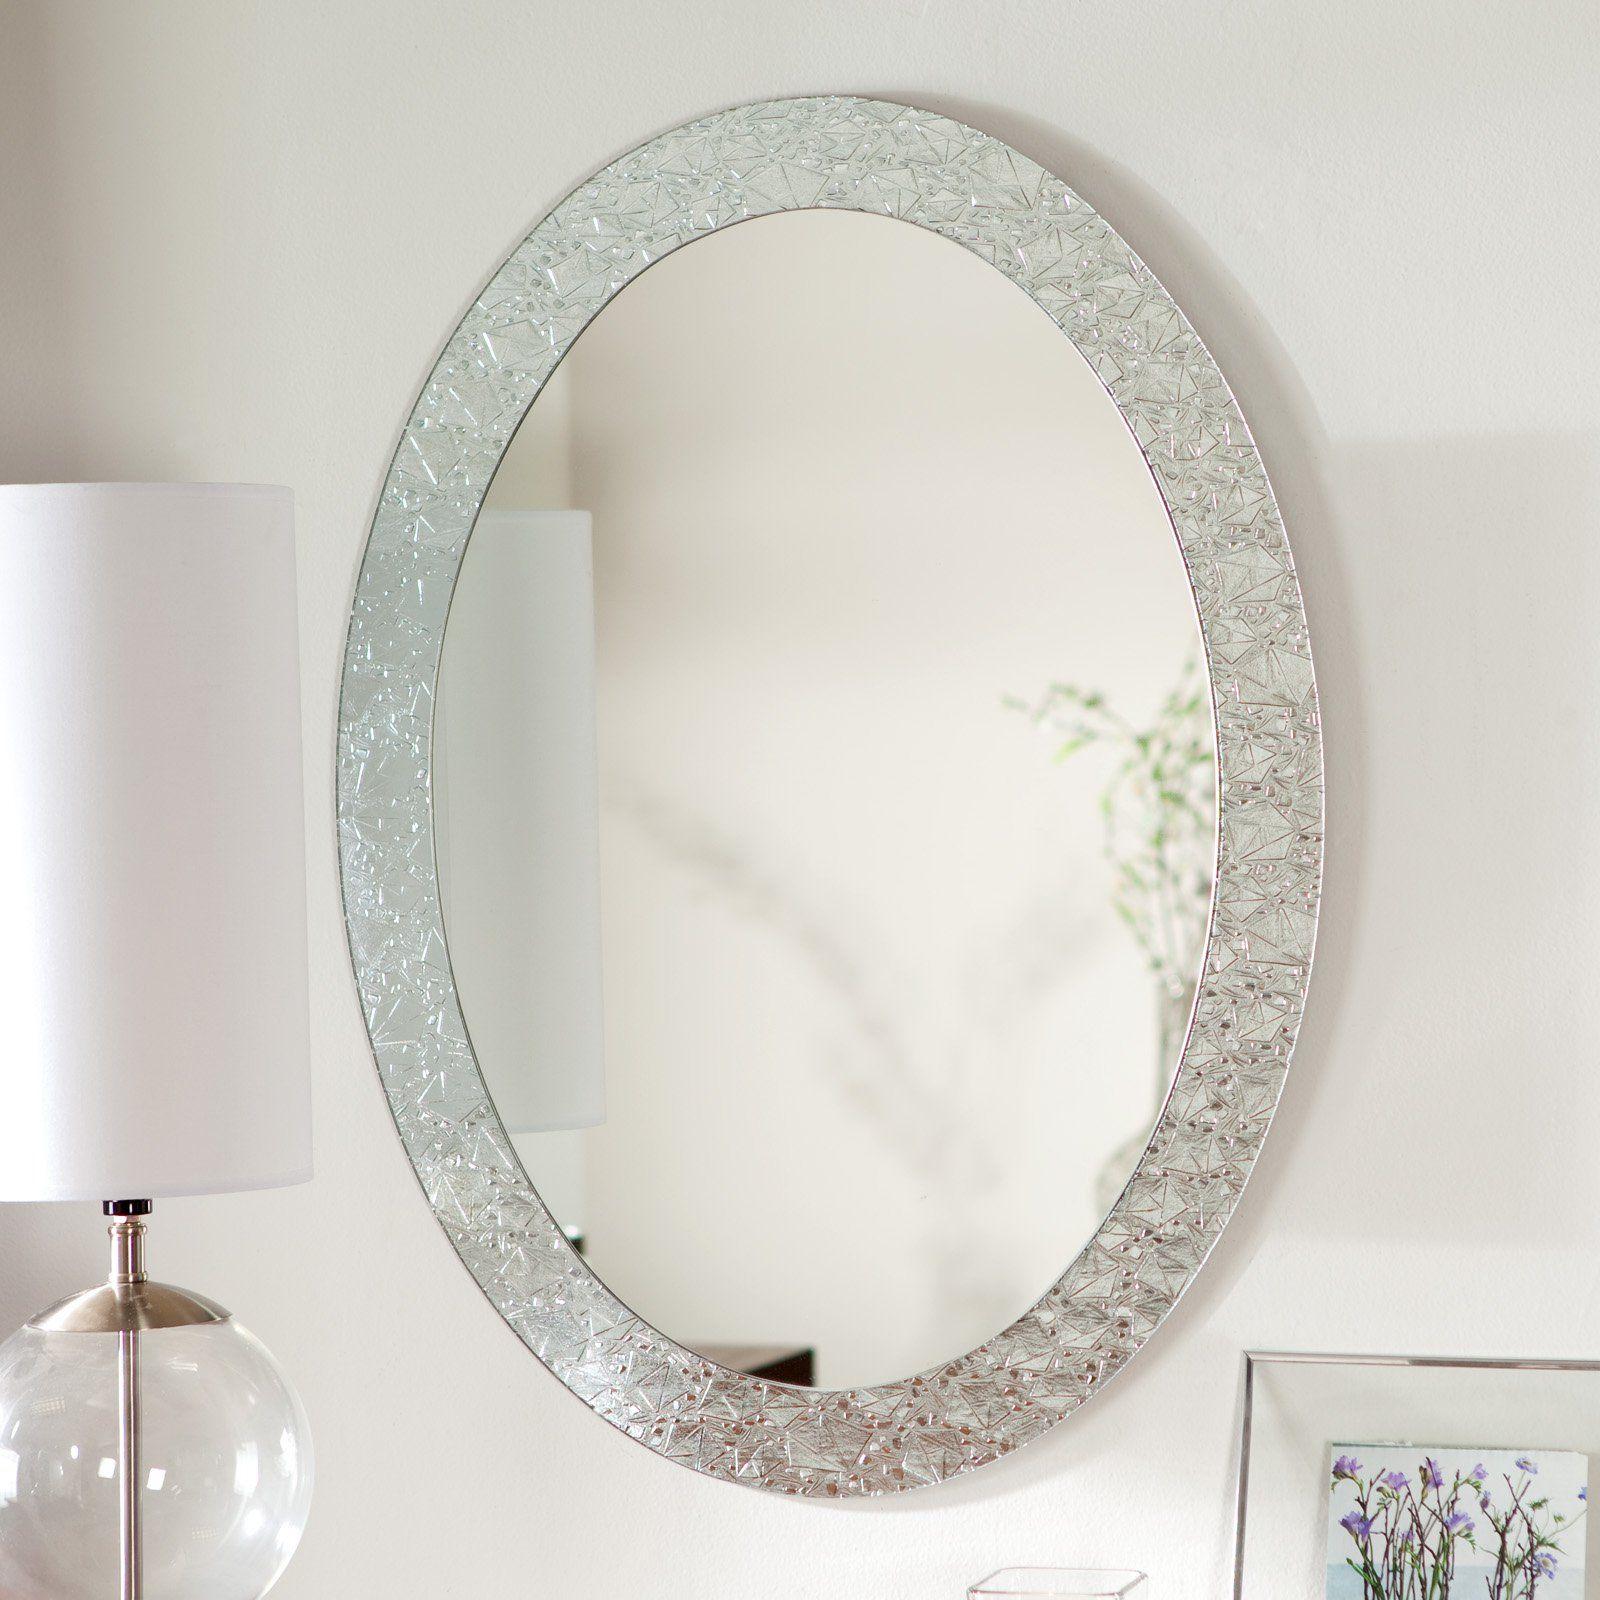 daƒacor wonderland frameless crystal wall mirror 23 5w x 31 5h in